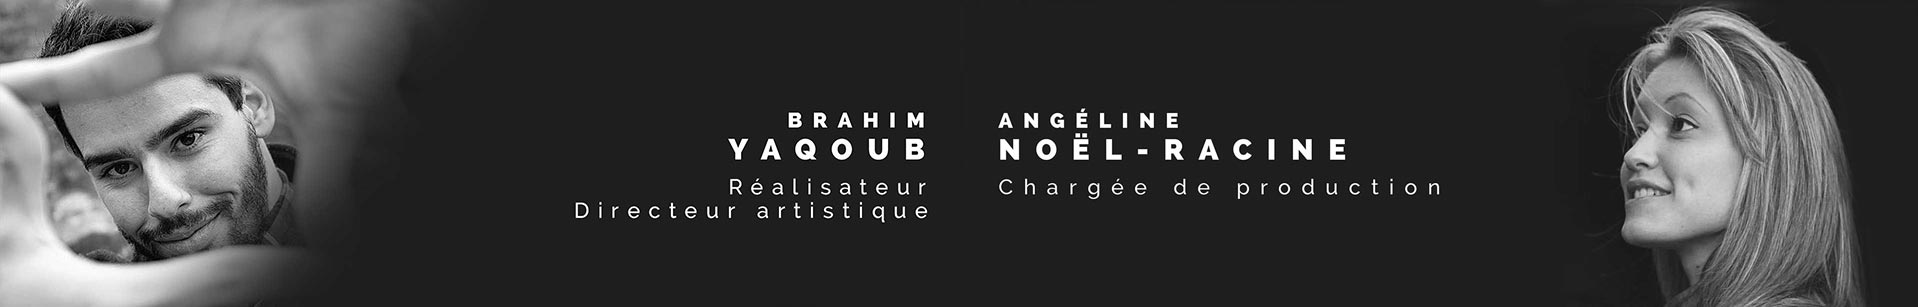 production audiovisuelle Nantes Brahim Yaqoub